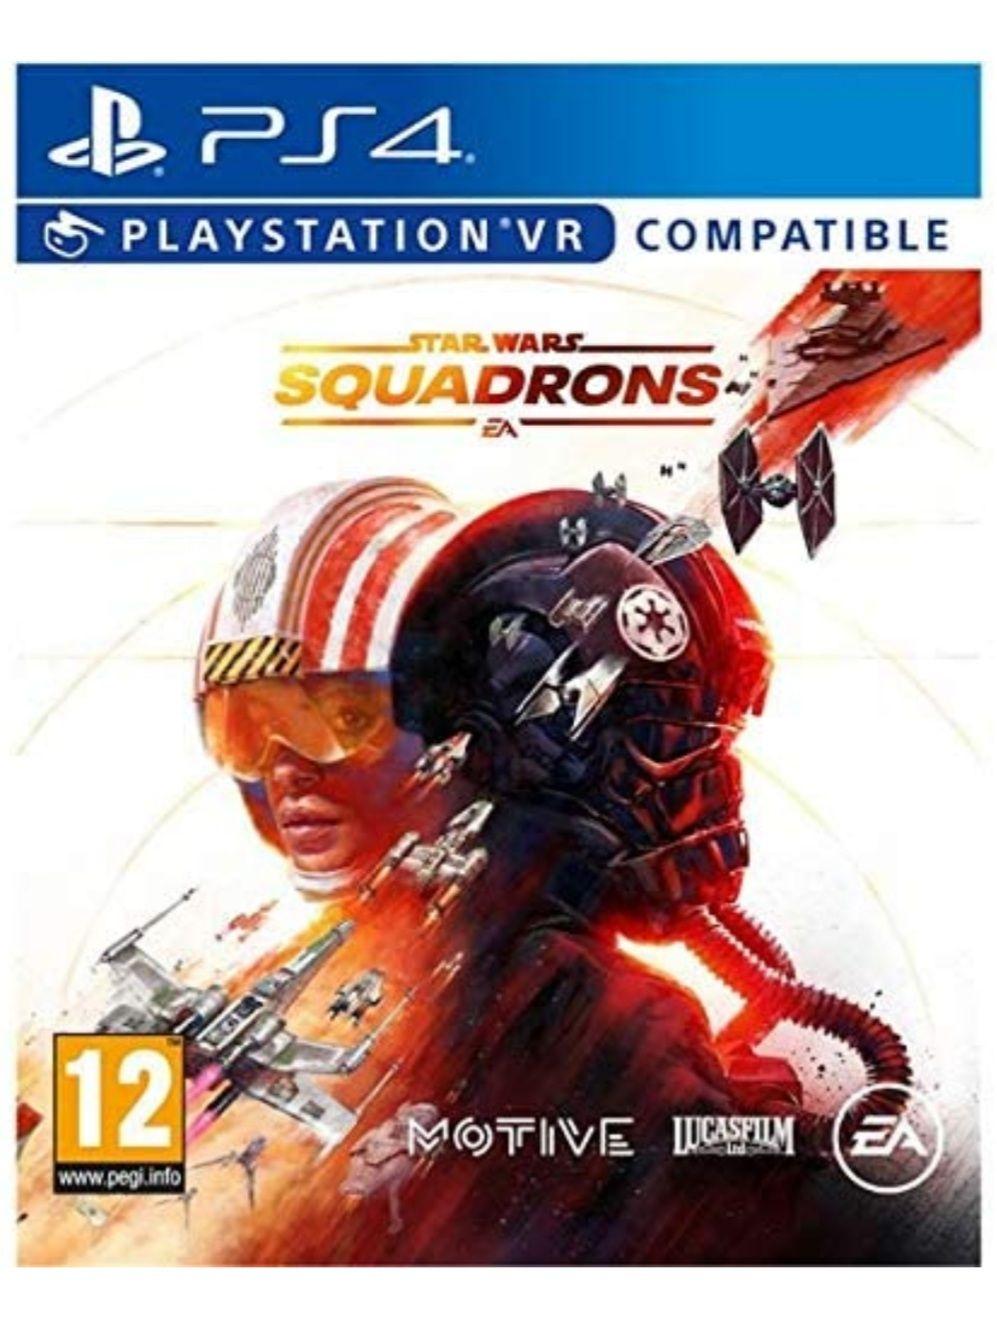 Star Wars Squadrons - PS4 (Mediamarkt y Amazon)